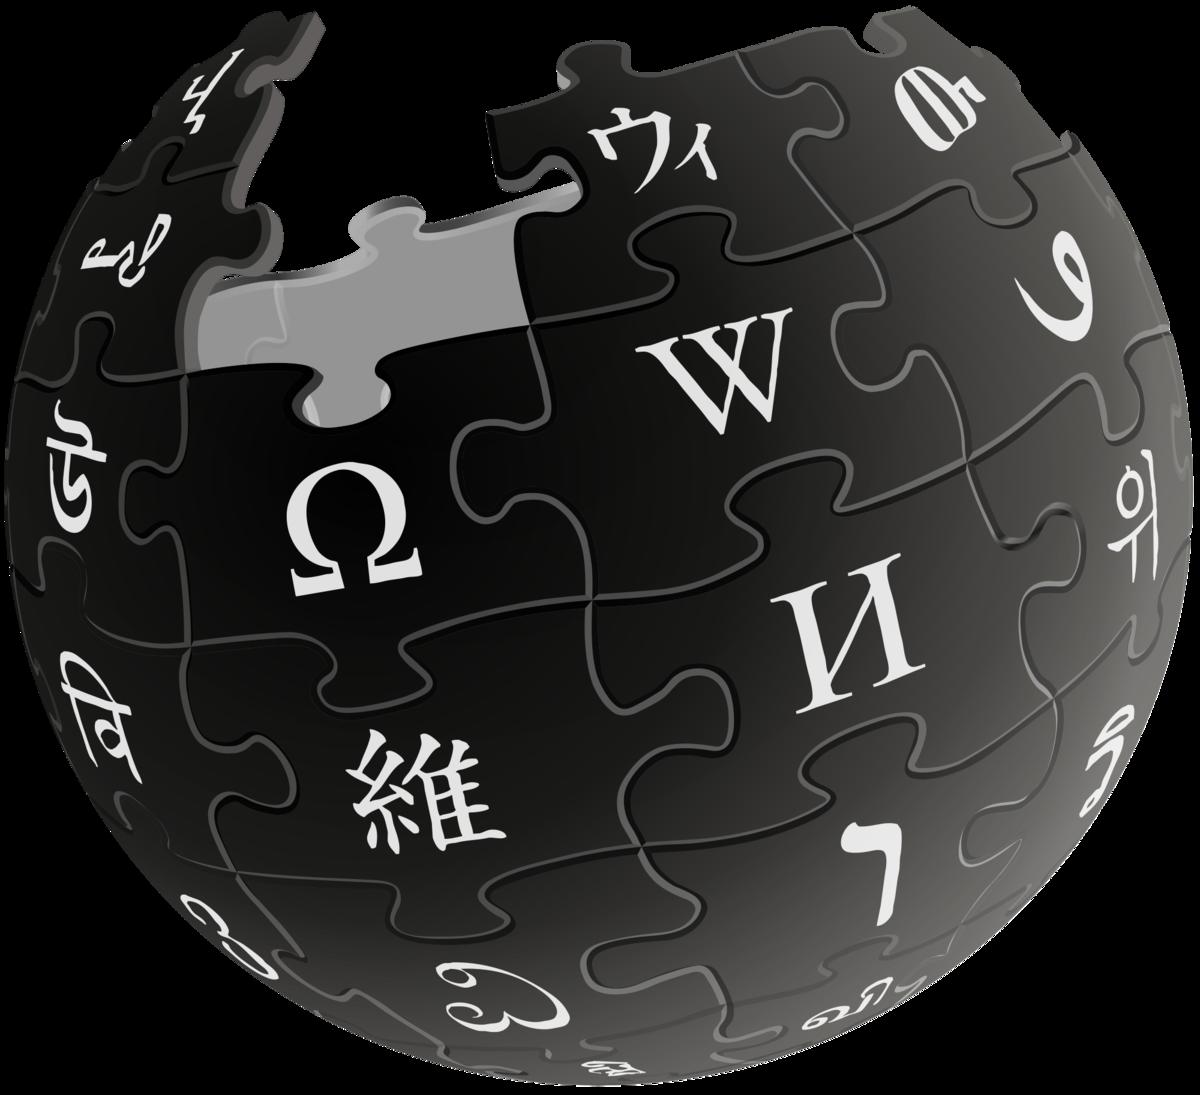 File:Wiki-black.png - Wikimedia Commons